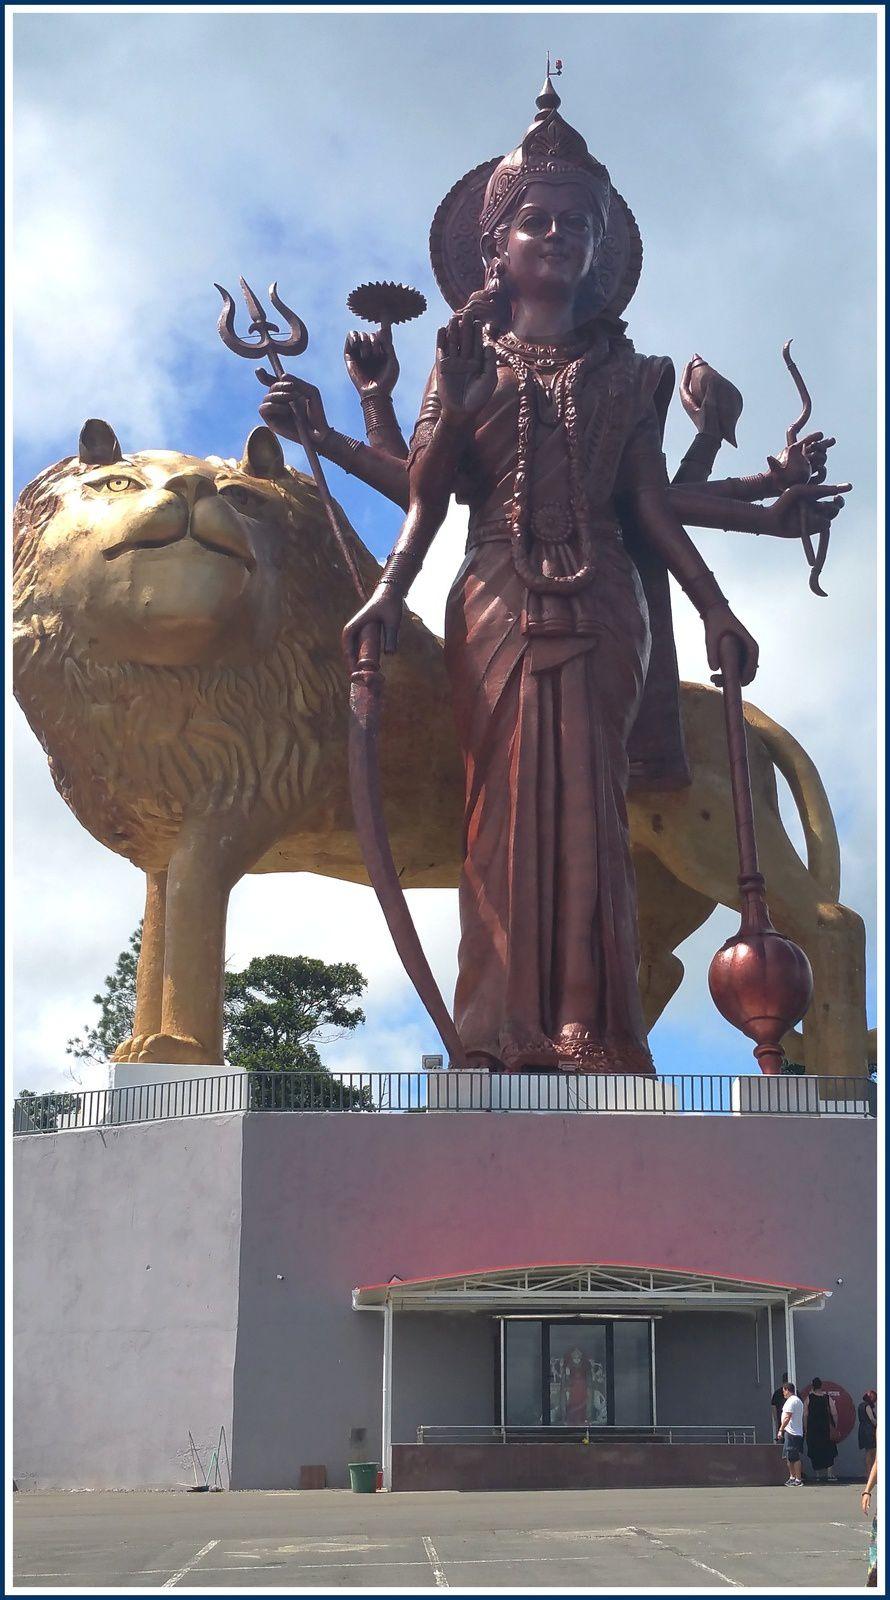 164 -  Ile MAURICE 11, photos, hindouisme, temples tamouls, Shiva, Ganesh, Hanoumân, Lakshmi, Durga, Goodlands, Grand-Bassin, Cap-Malheureux, photos by GeoMar